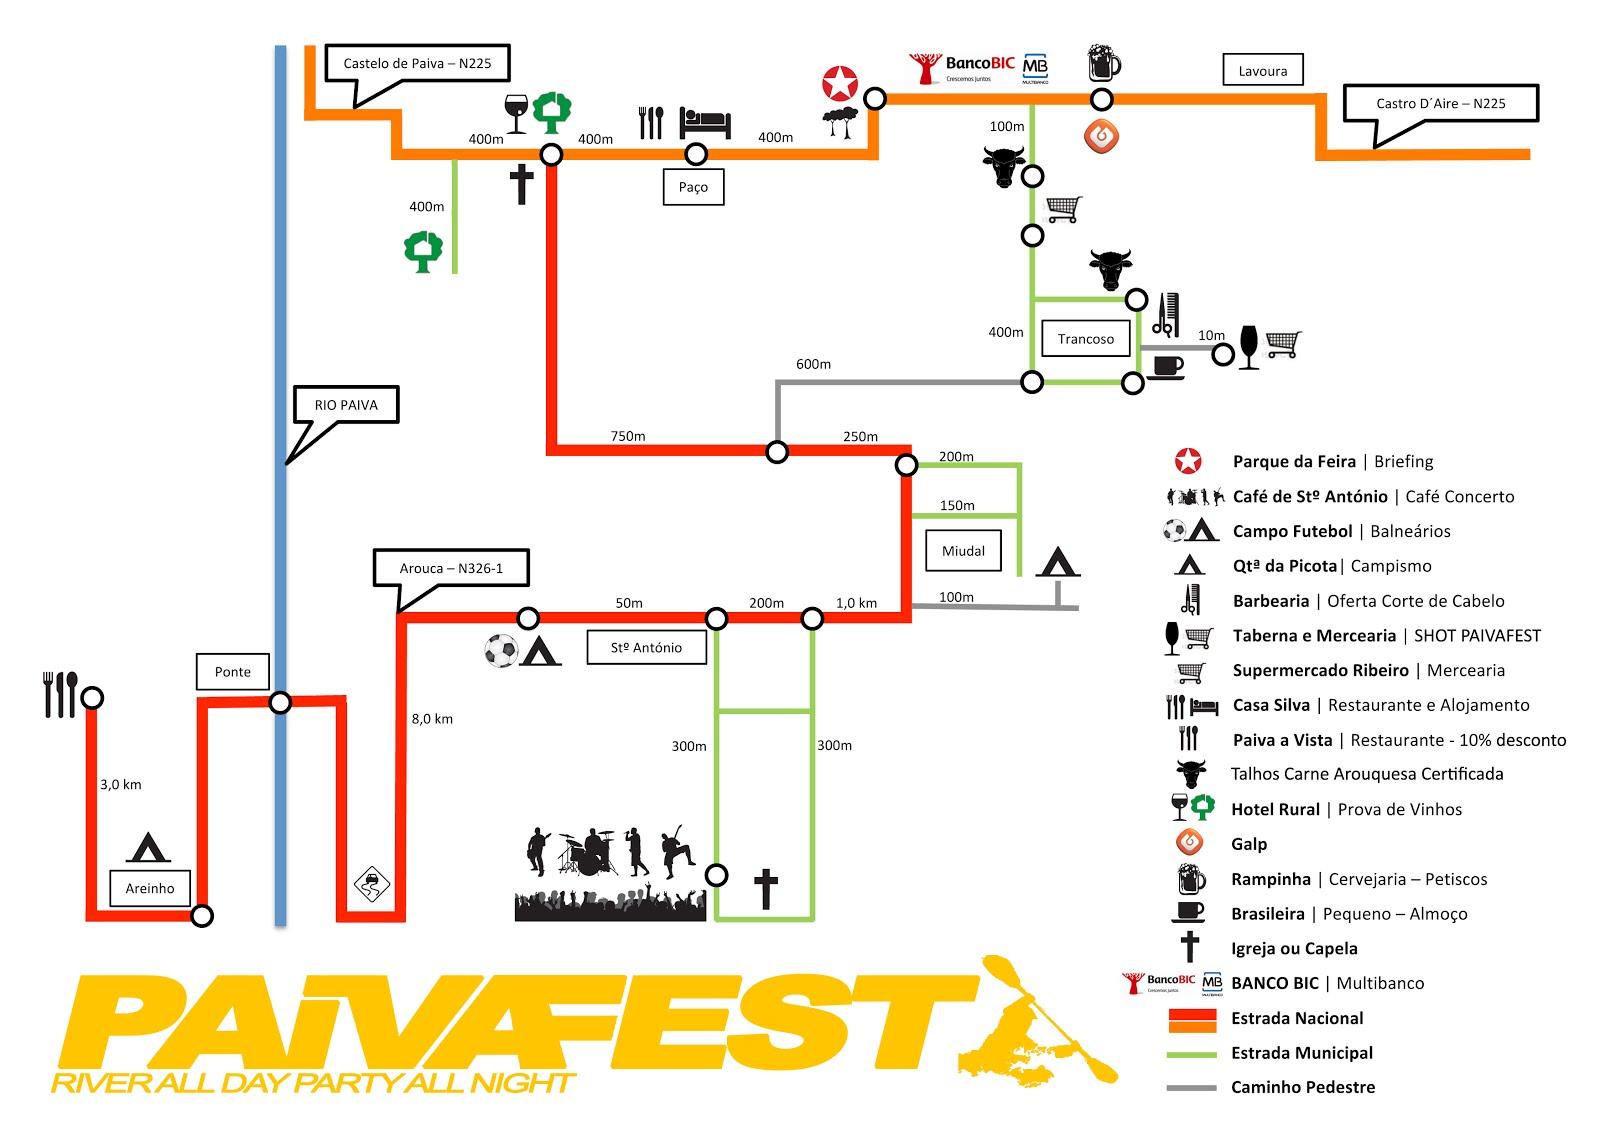 Aldeia Paiva Fest | Paiva Fest Village